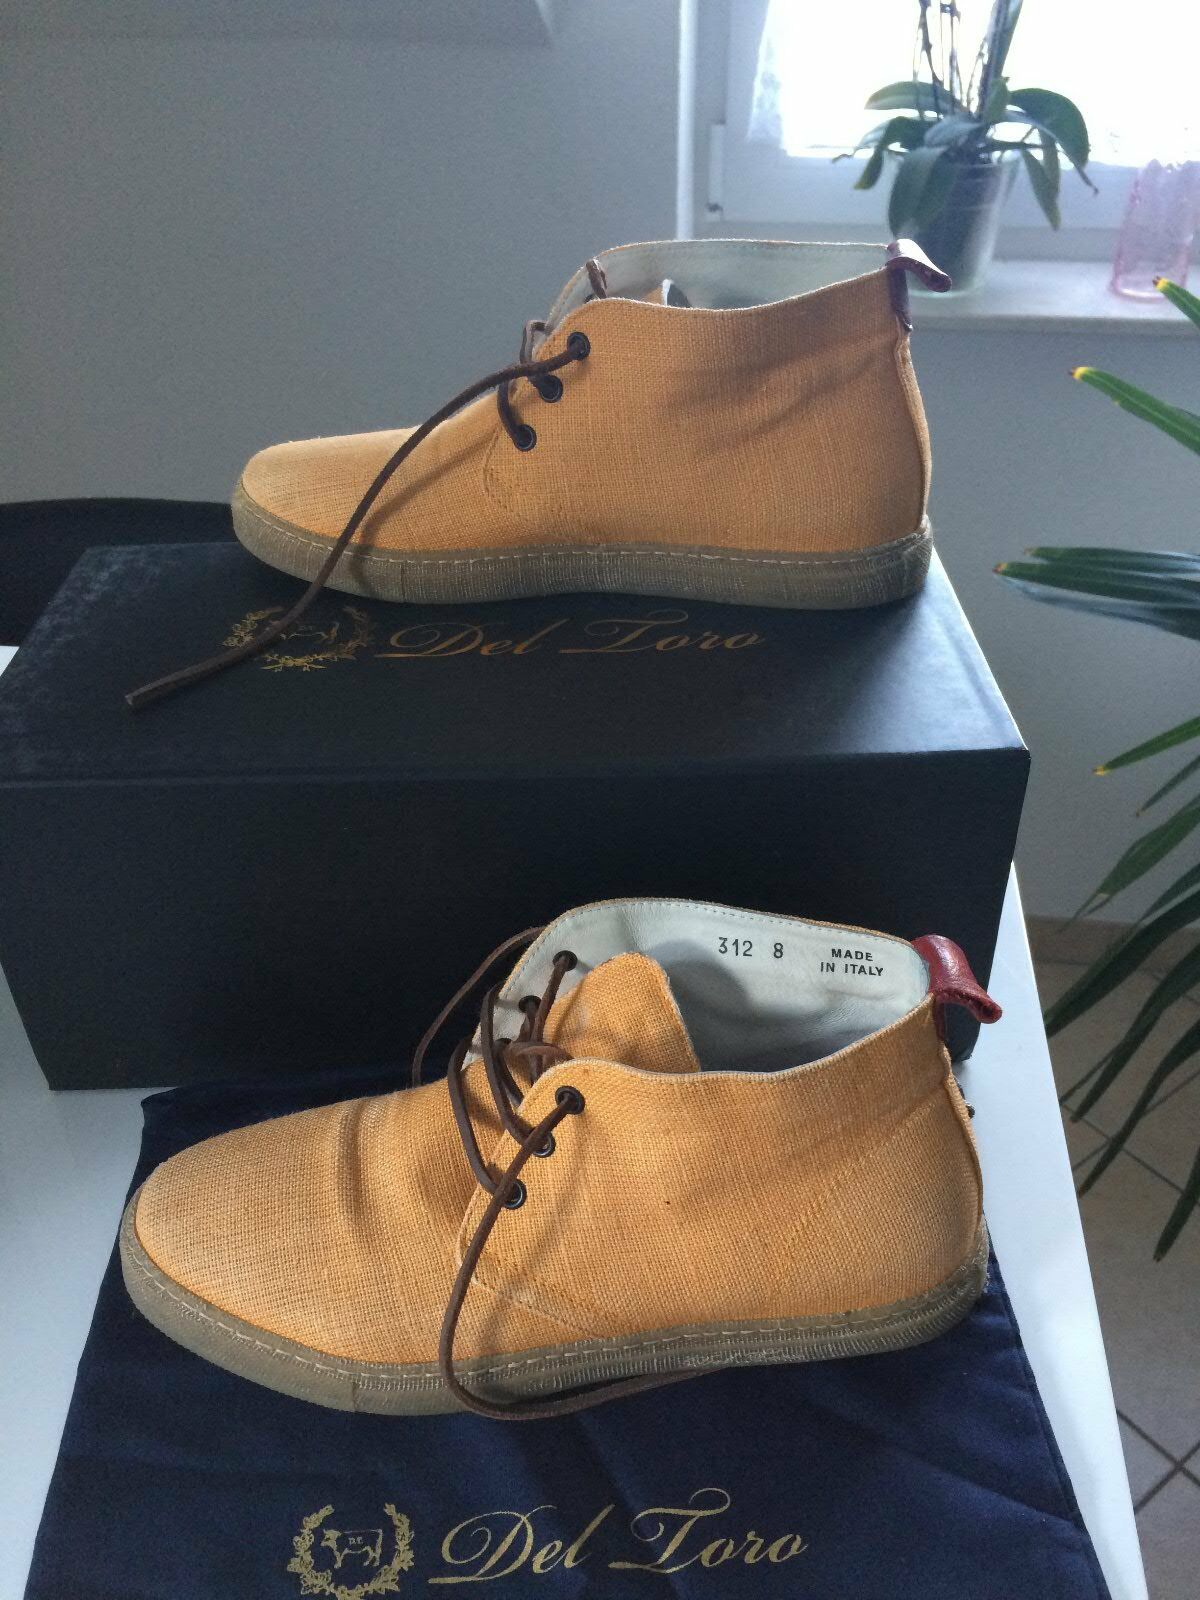 Del Tor 41 NBA Russel Westbrook Designer chaussures avec facture